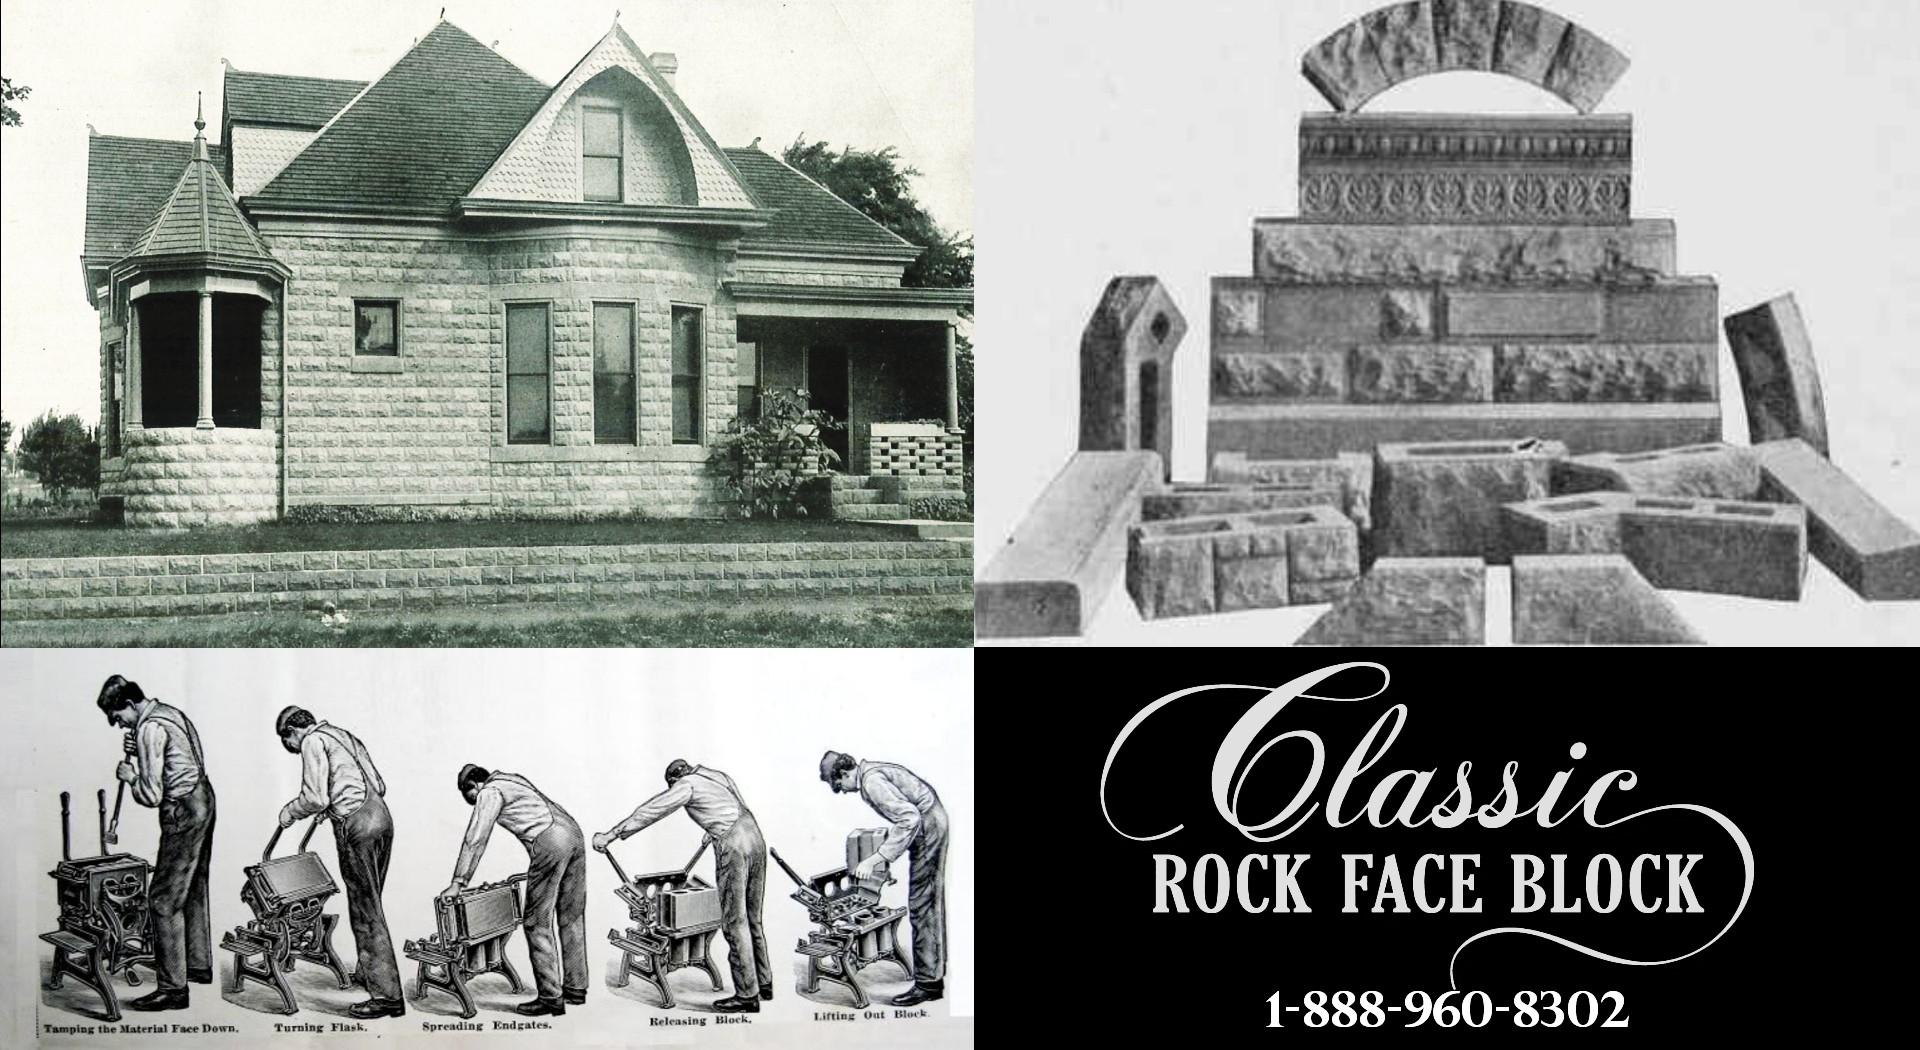 Classic Rock Face Block Slider 4